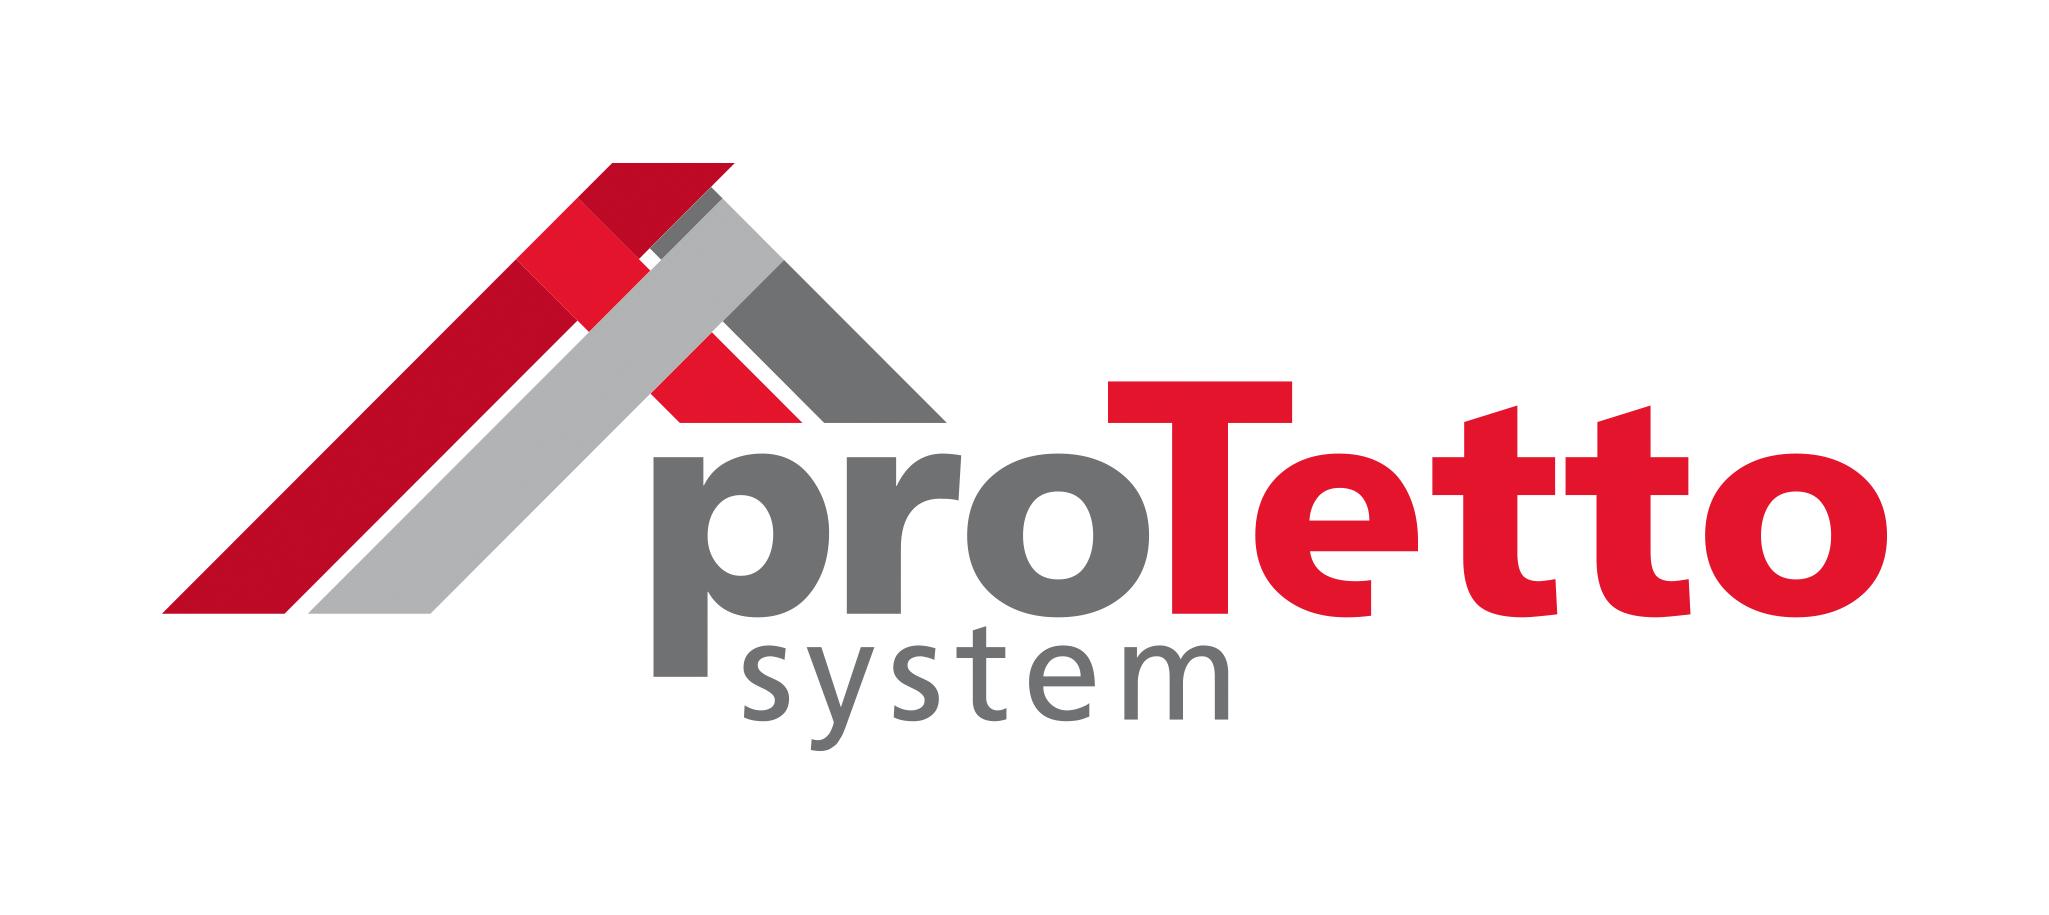 protettosystem